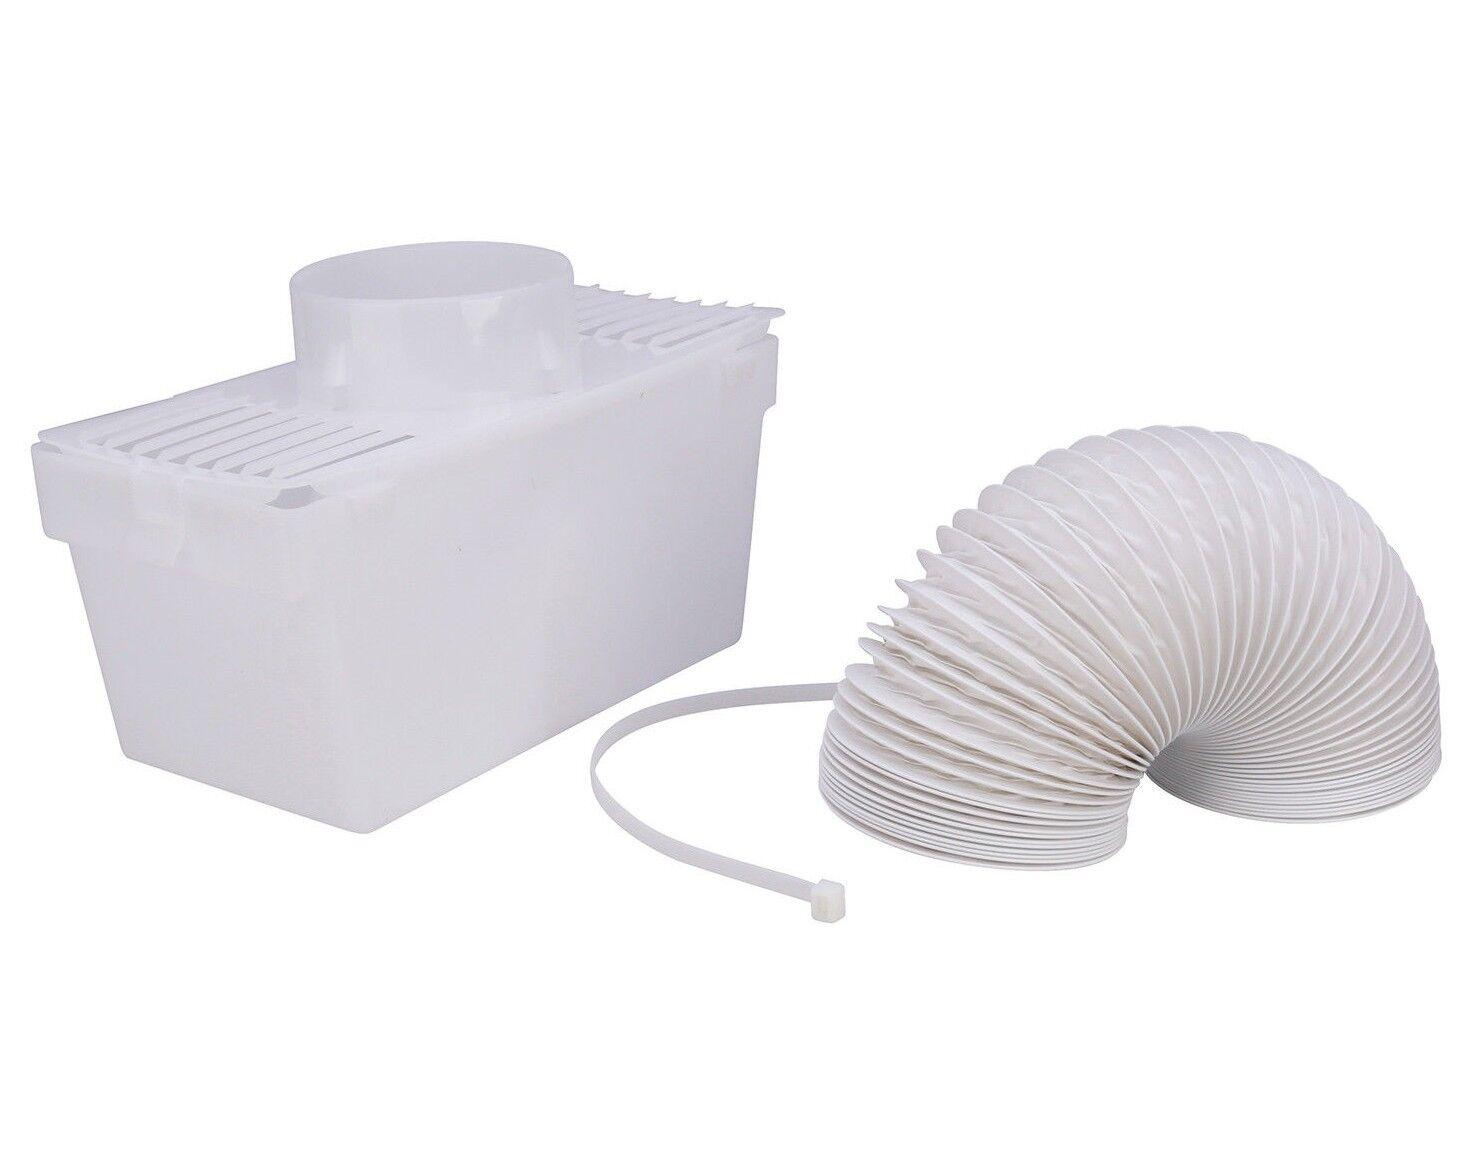 Crusader 37317 Tumble Dryer Venting Kit Genuine